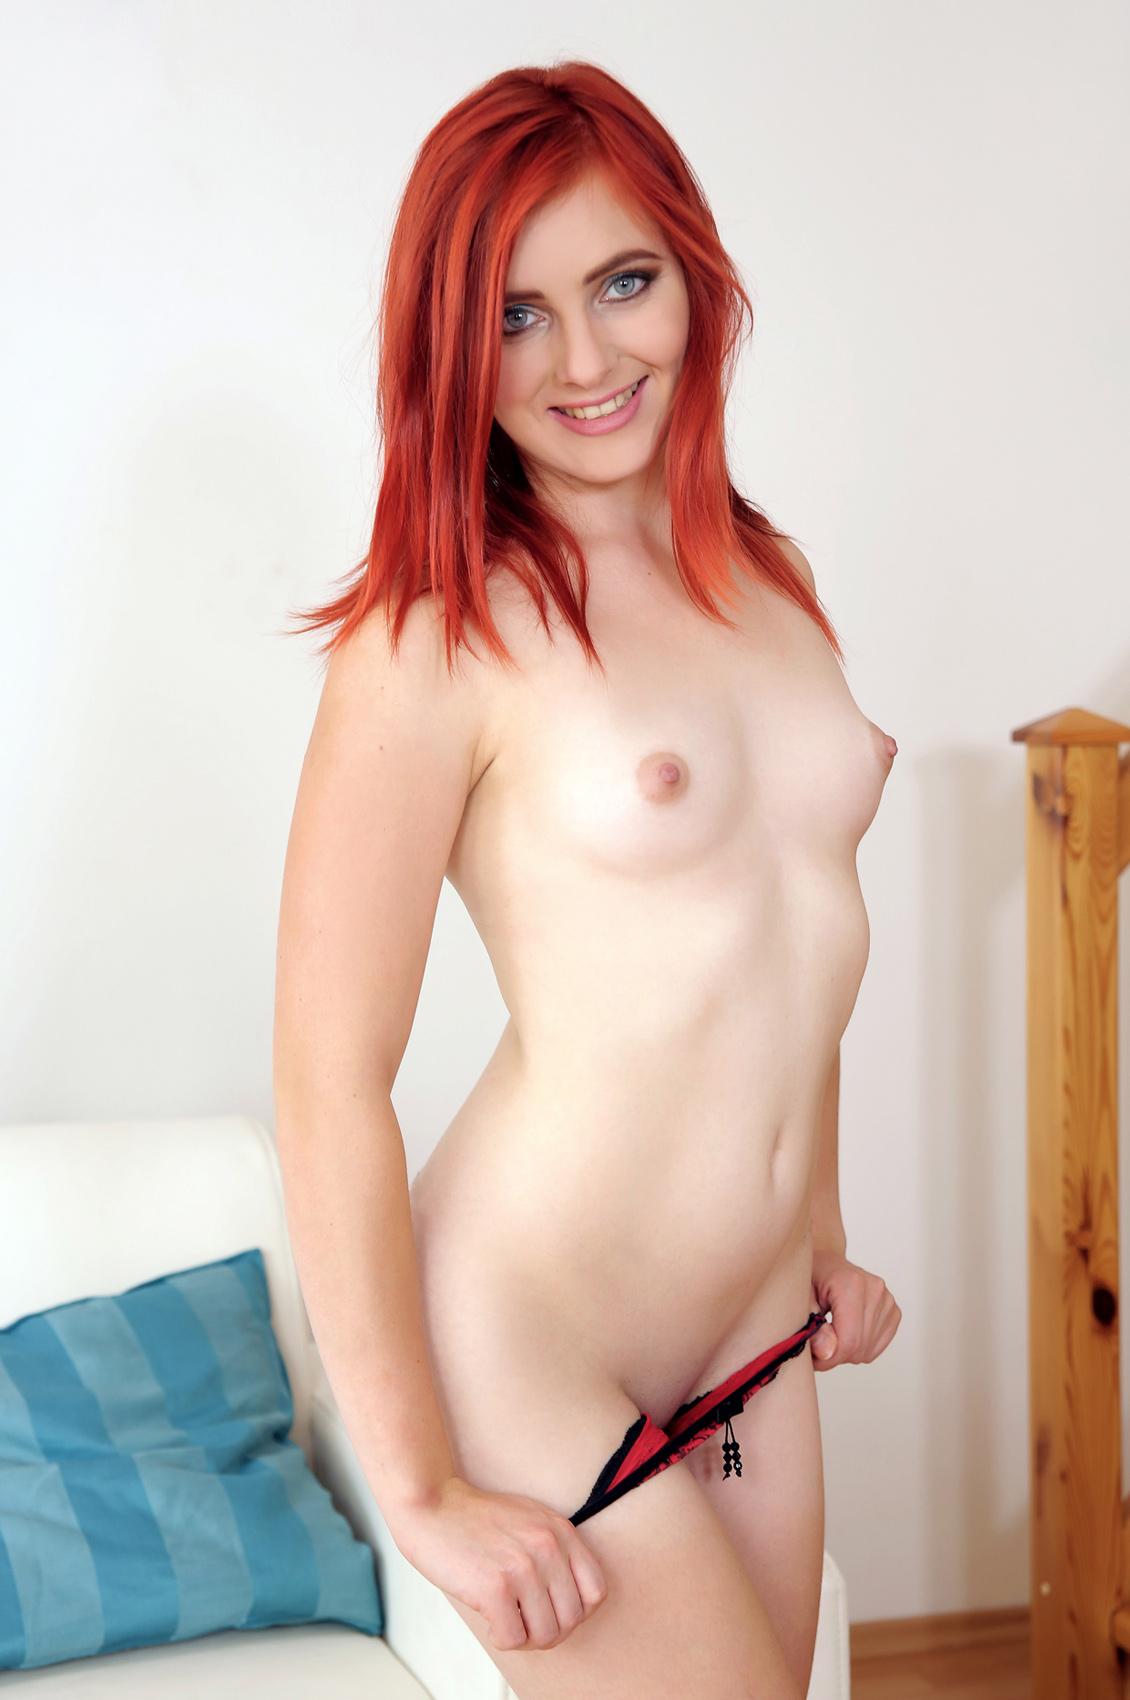 Vanessa Shelby's VR Porn Videos, Bio & Free Nude Pics